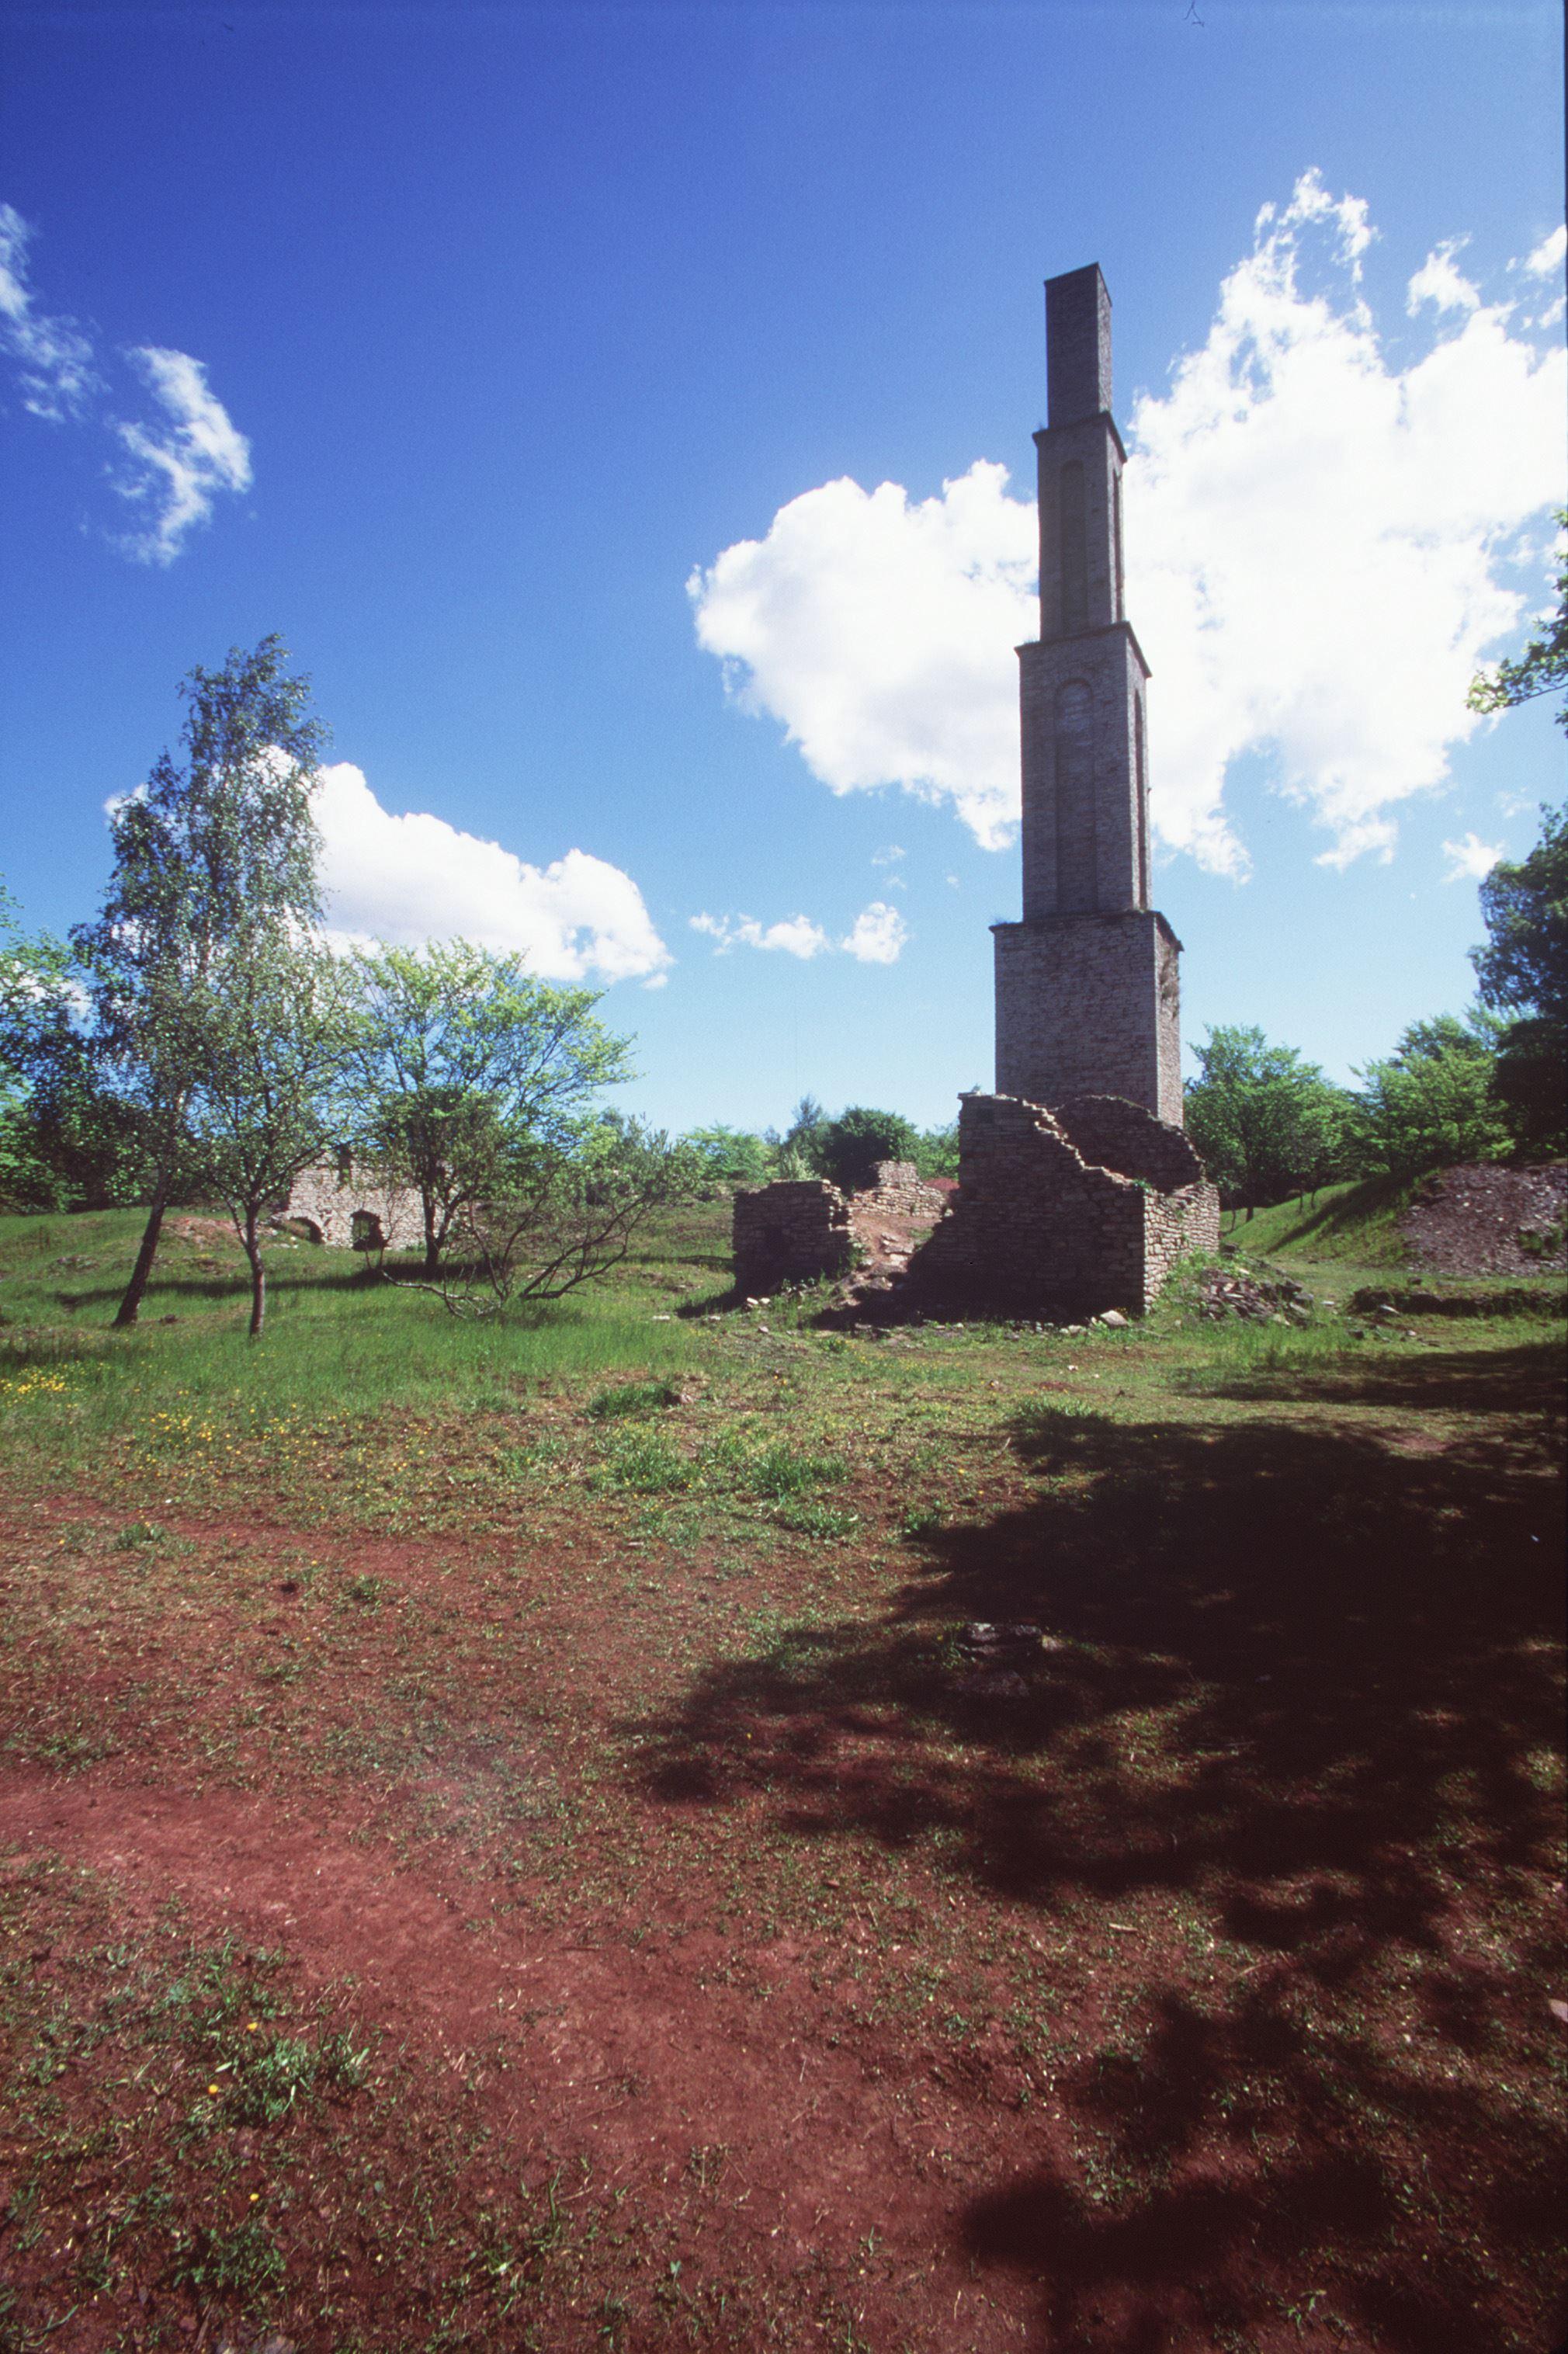 Alunbruken i Degerhamn